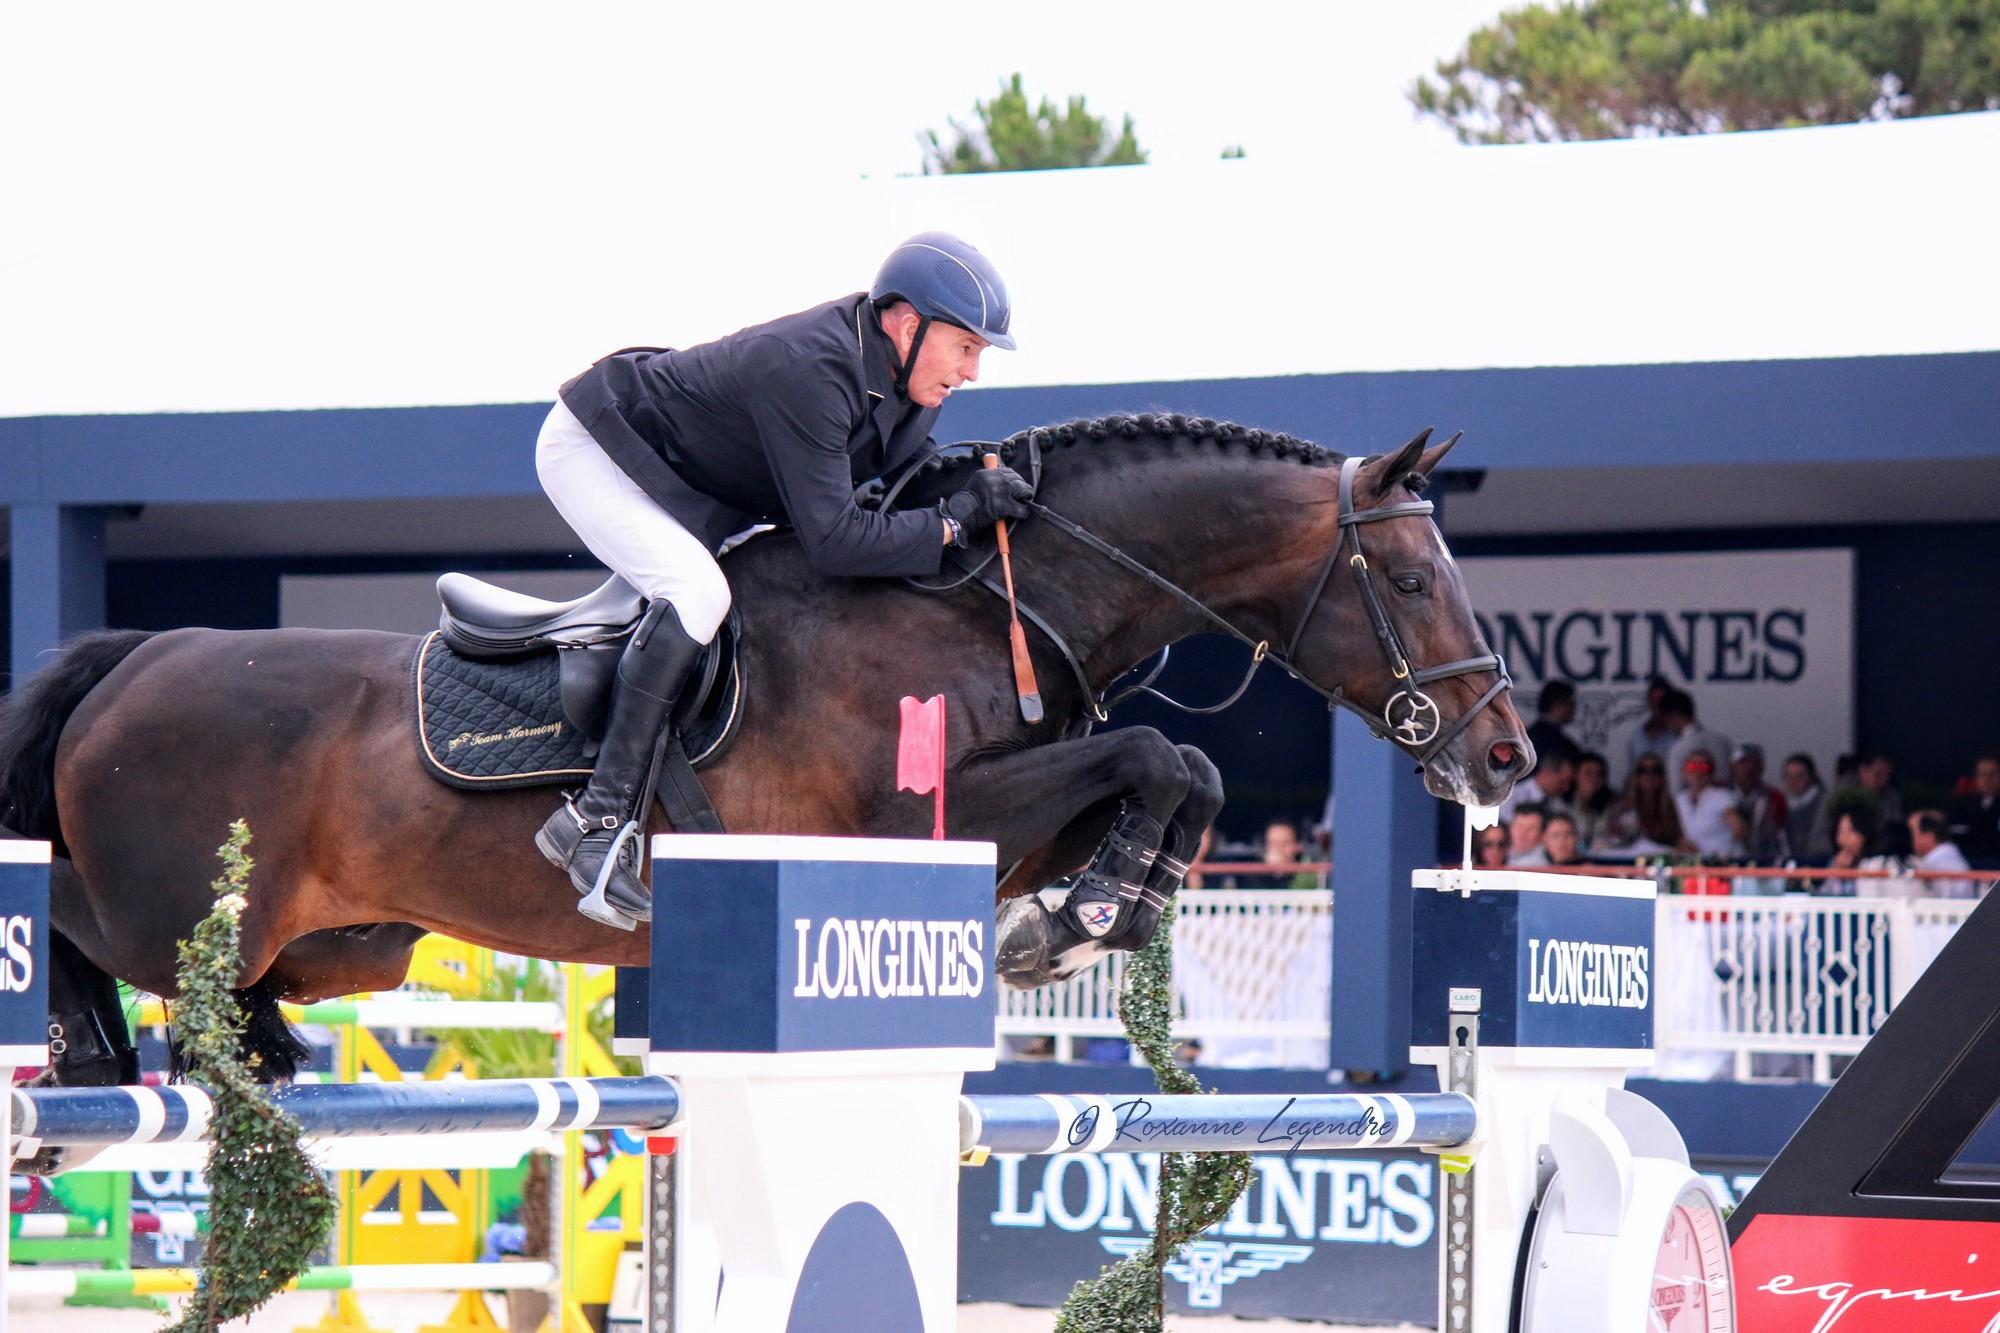 www.pegasebuzz.com | Athina Onassis Horse Show 2016 - LGCT Saint-Tropez - William Whitaker.